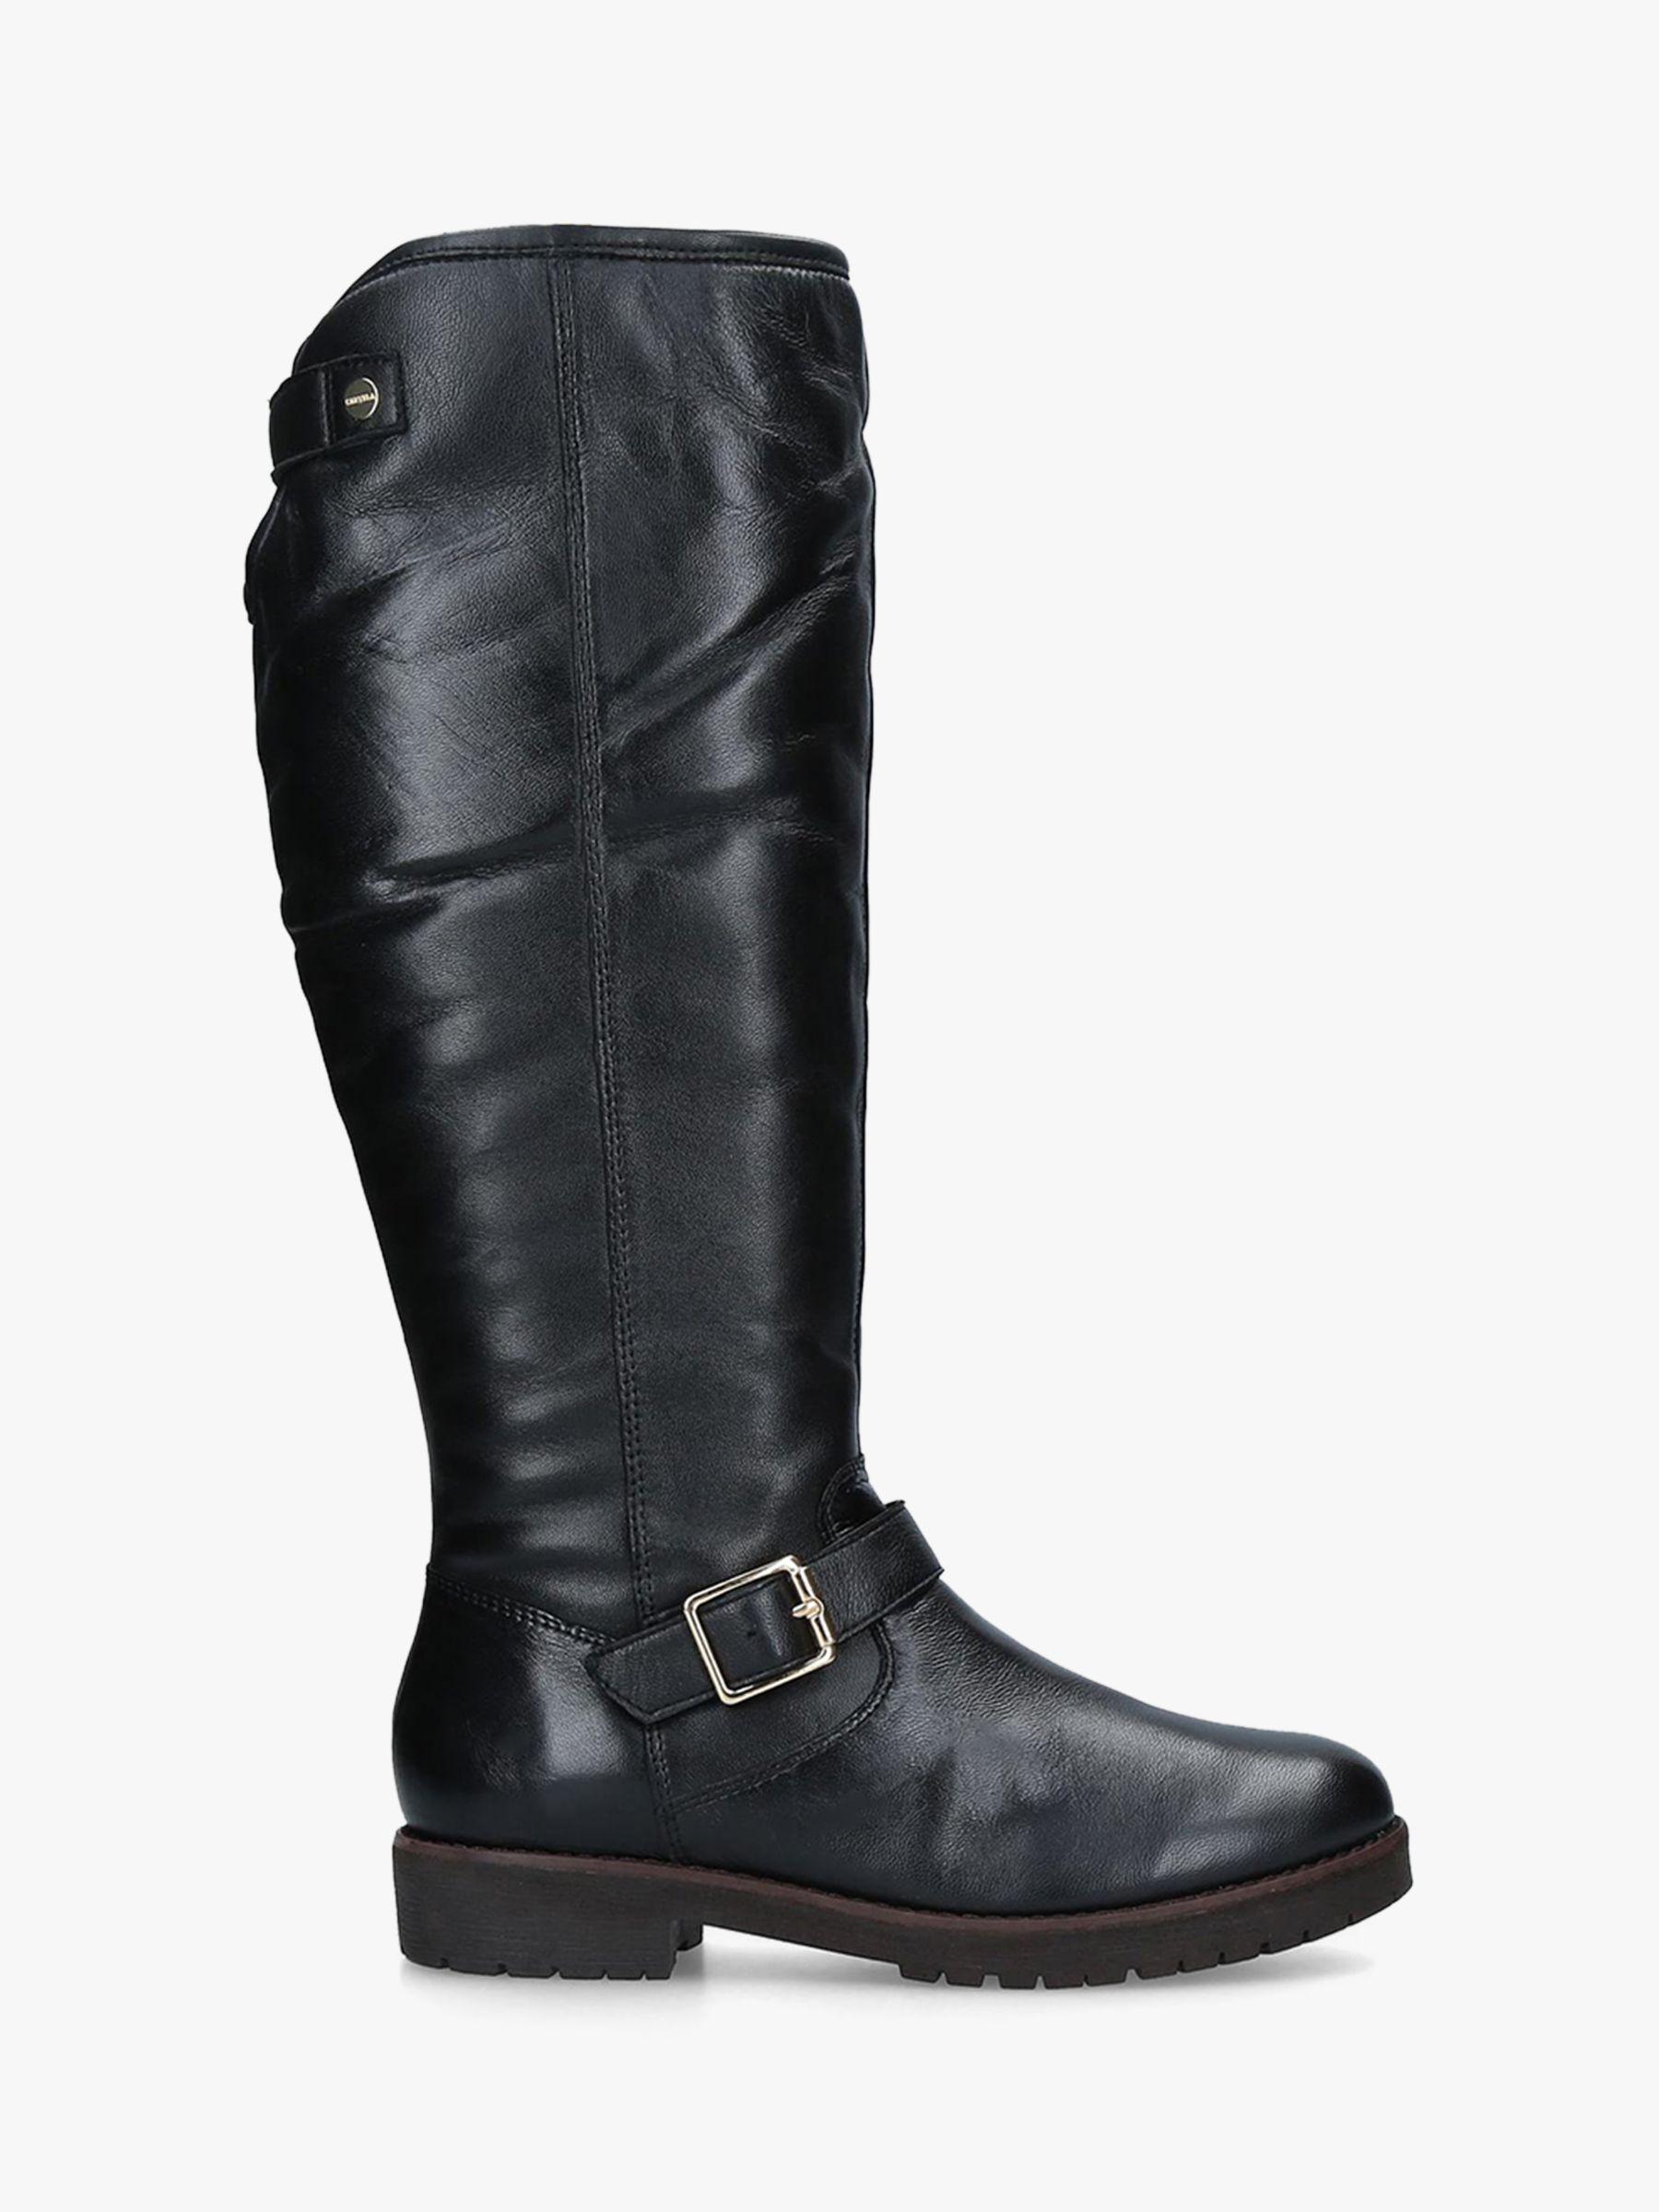 Carvela Carvela Samba Buckle Detail Knee High Boots, Black Leather